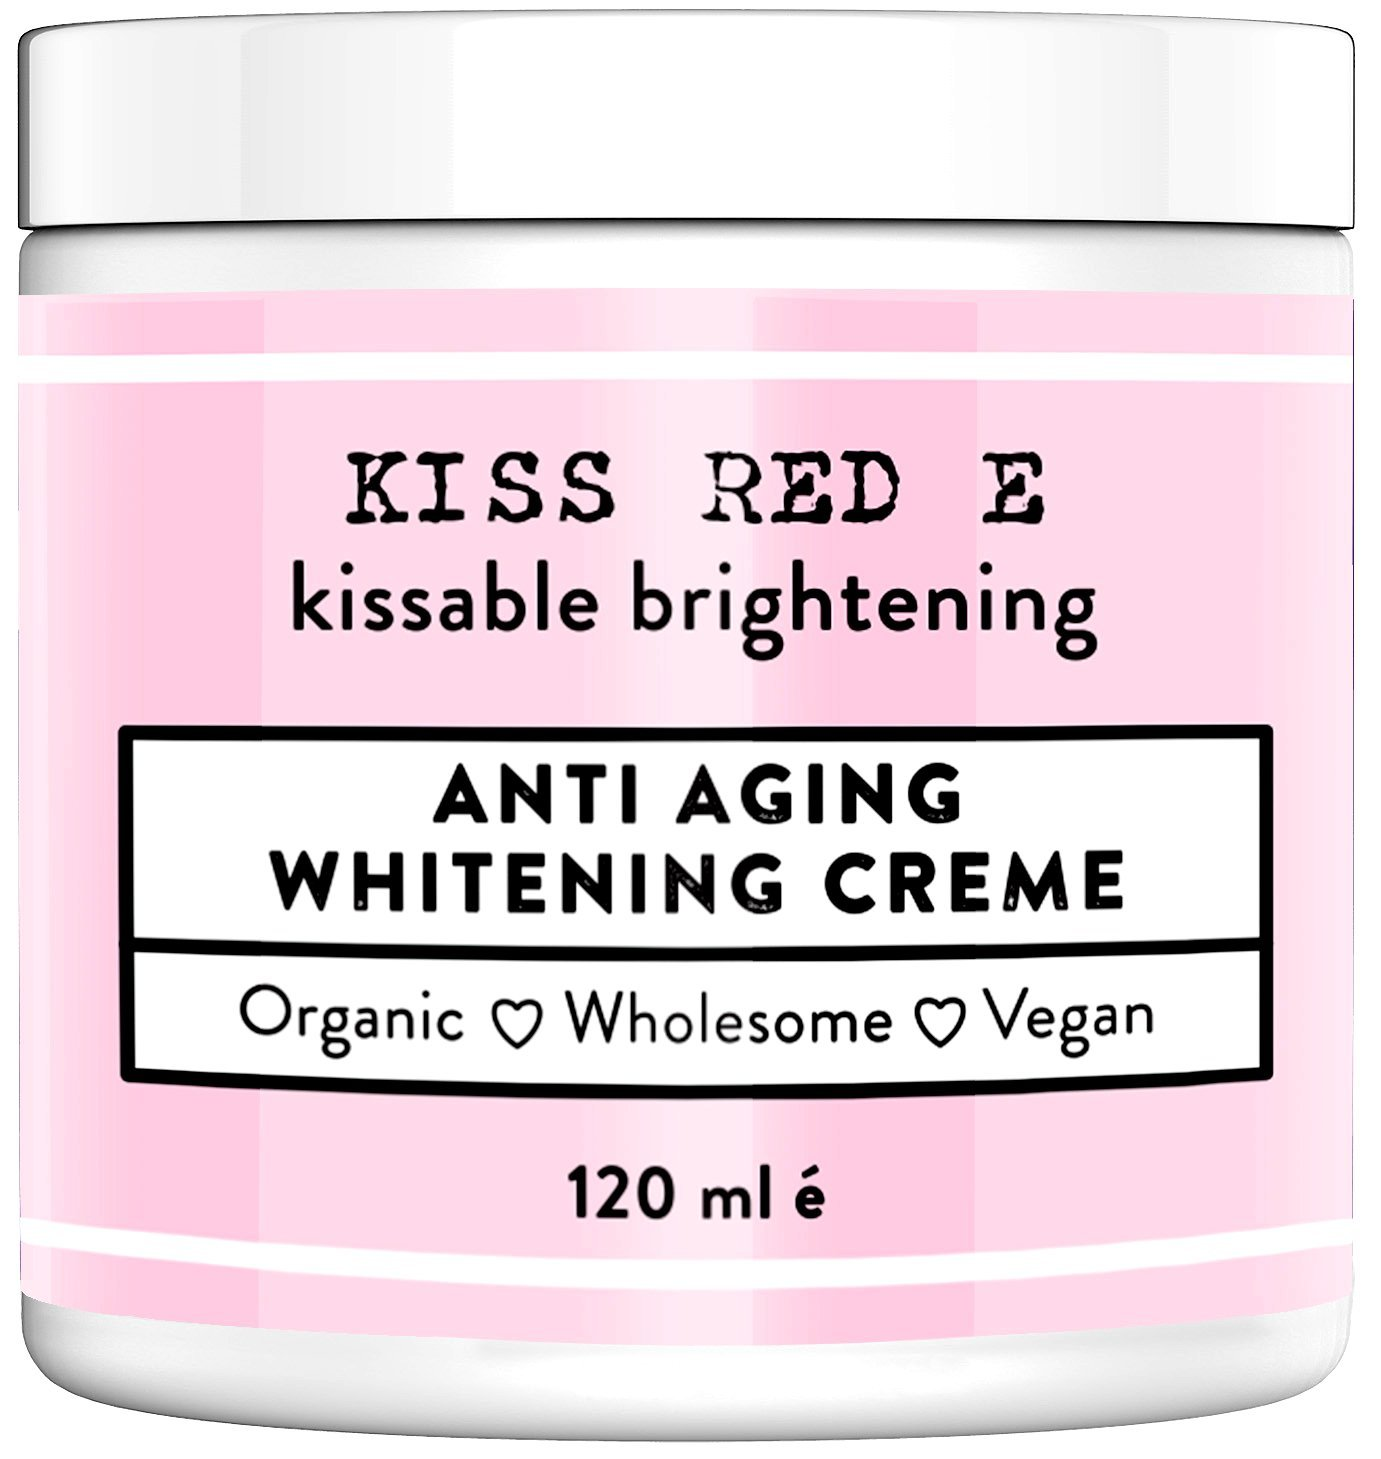 Whitening Cream. Anti Aging Skin Lightening Cream - Dark Spot Corrector for Face - Day Night Moisturizing Cream by KissRedE